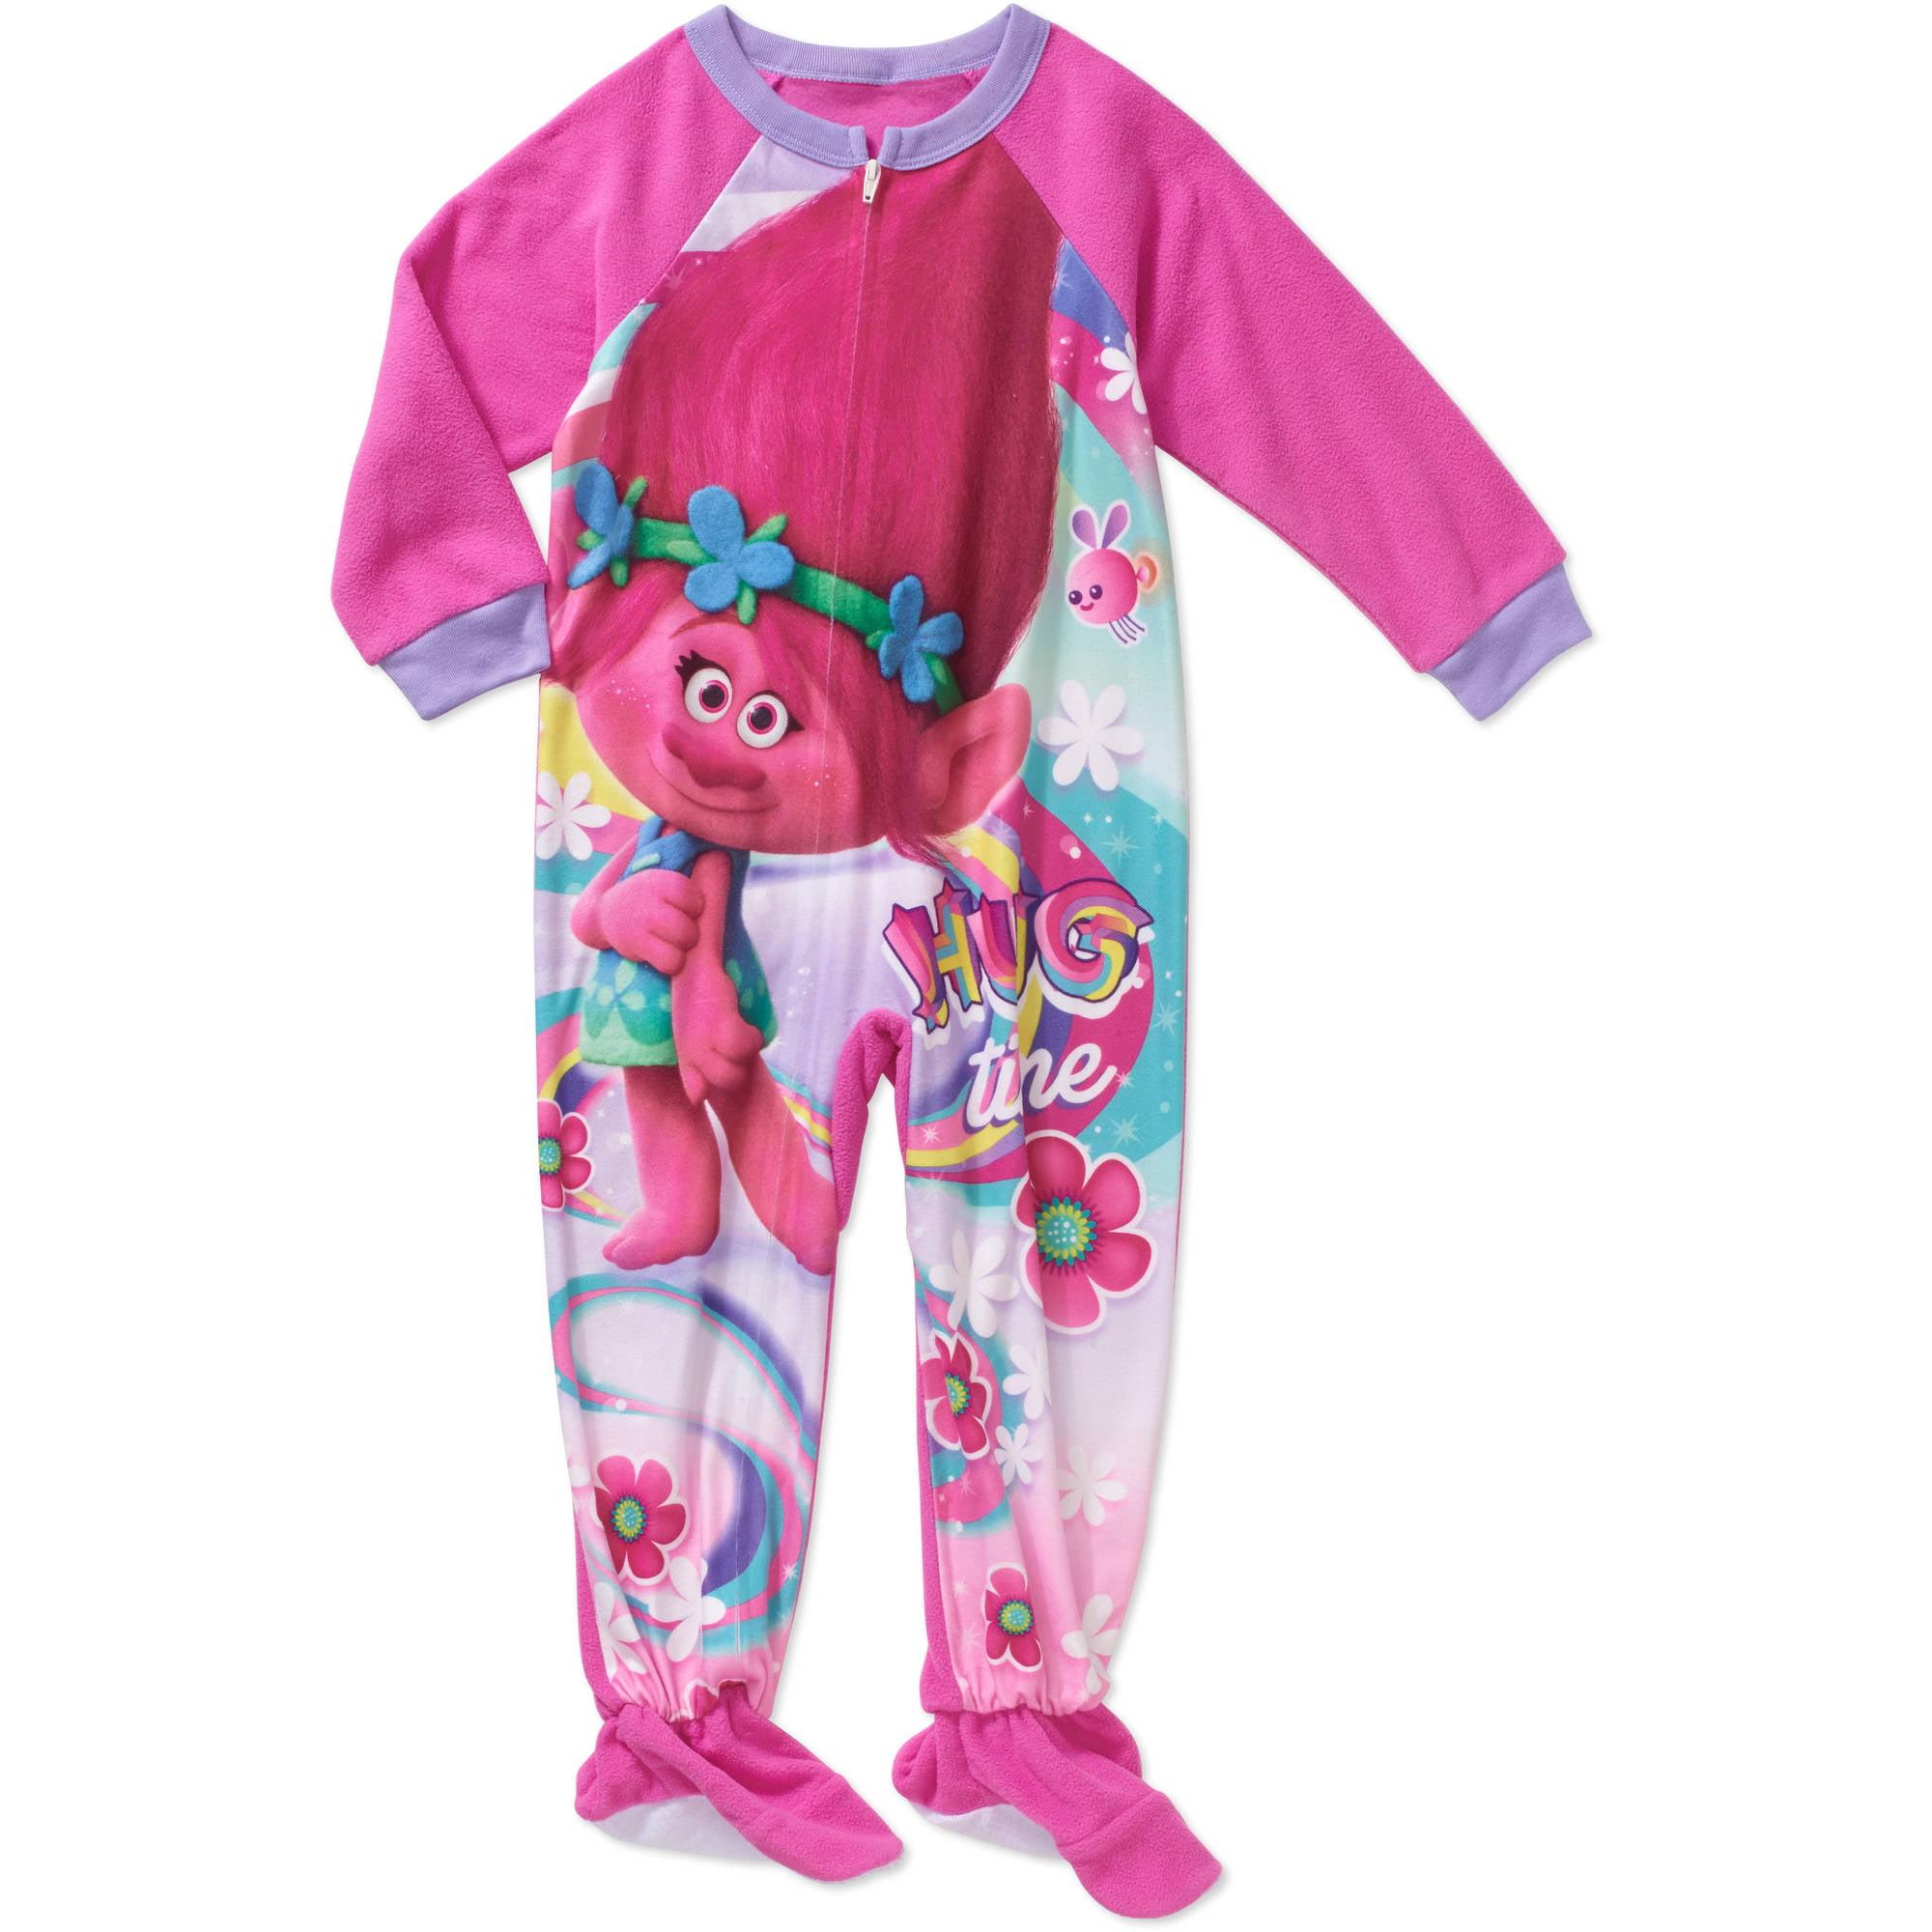 Trolls Toddler Girl Hug Time Micro Fleece Footed PJ